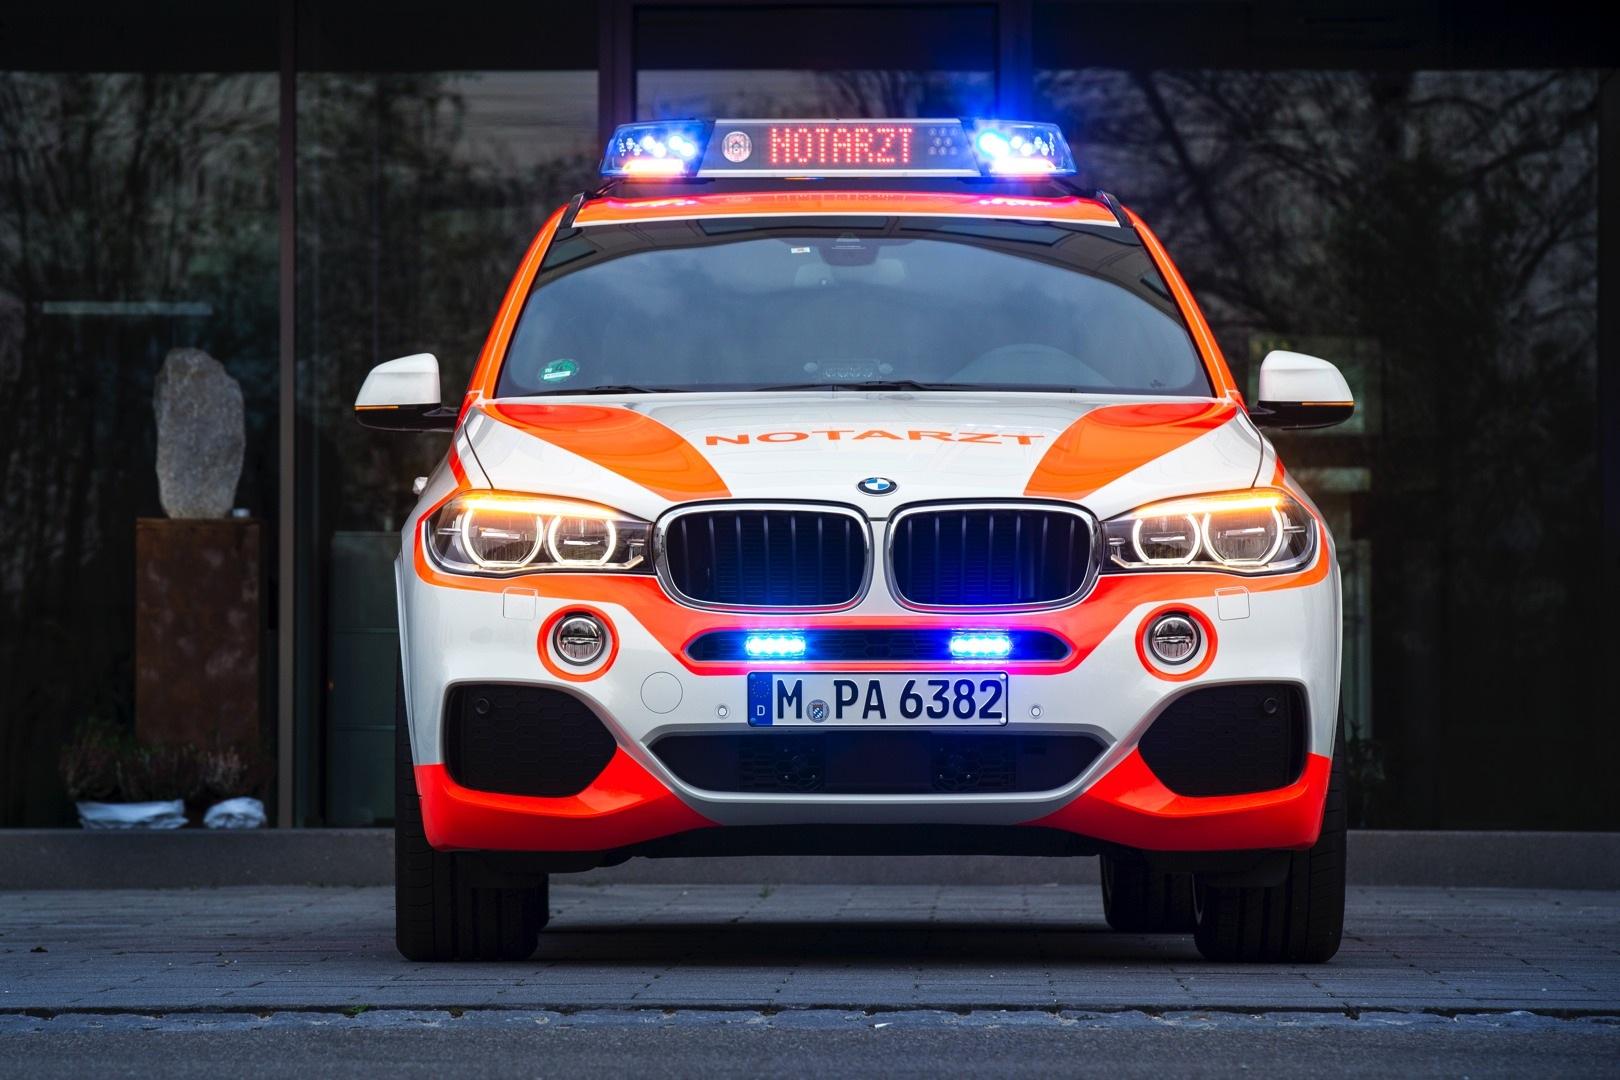 Bmw To Unveil M235i Paramedic Vehicle At Rettmobil 2014